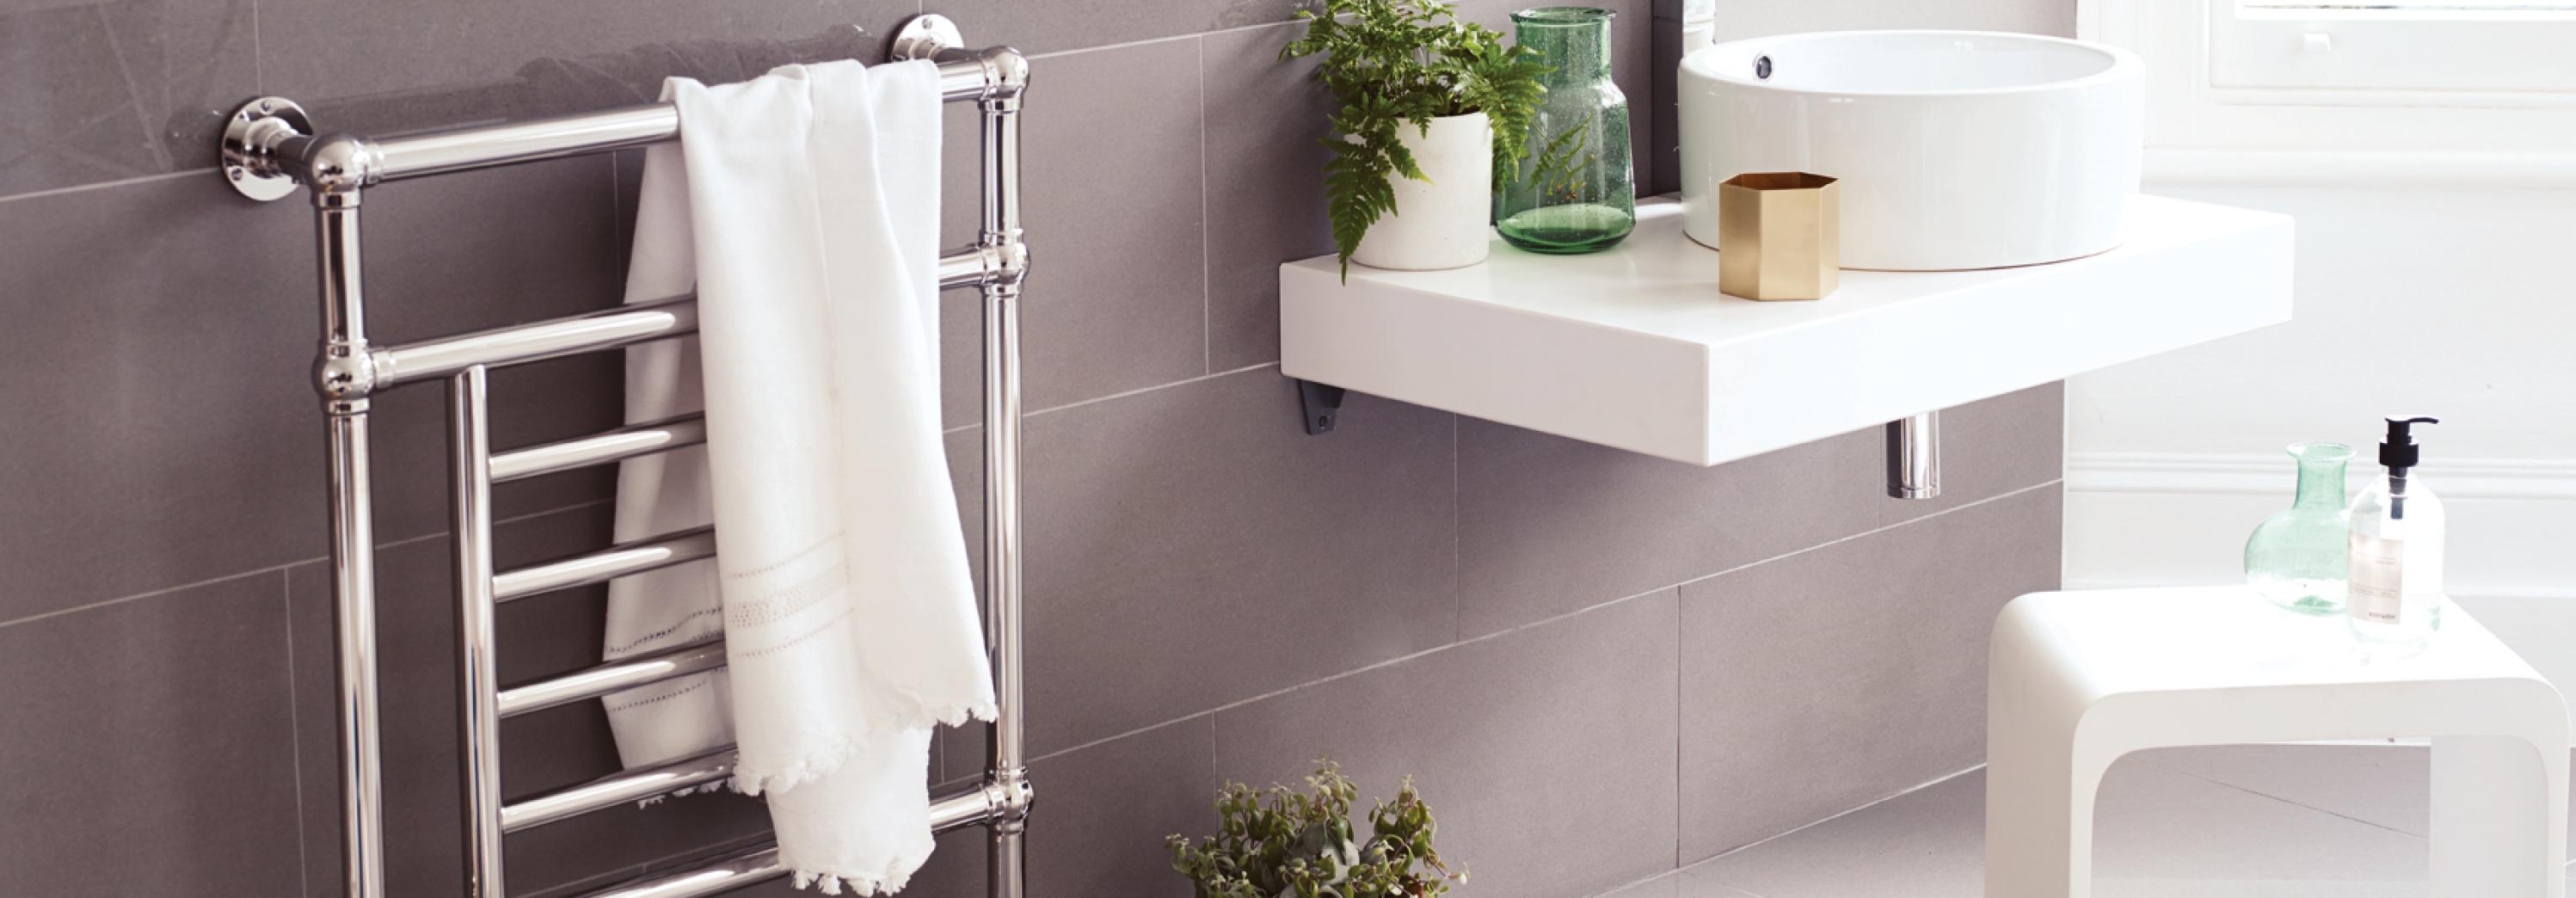 Holmwood Towel Warmers